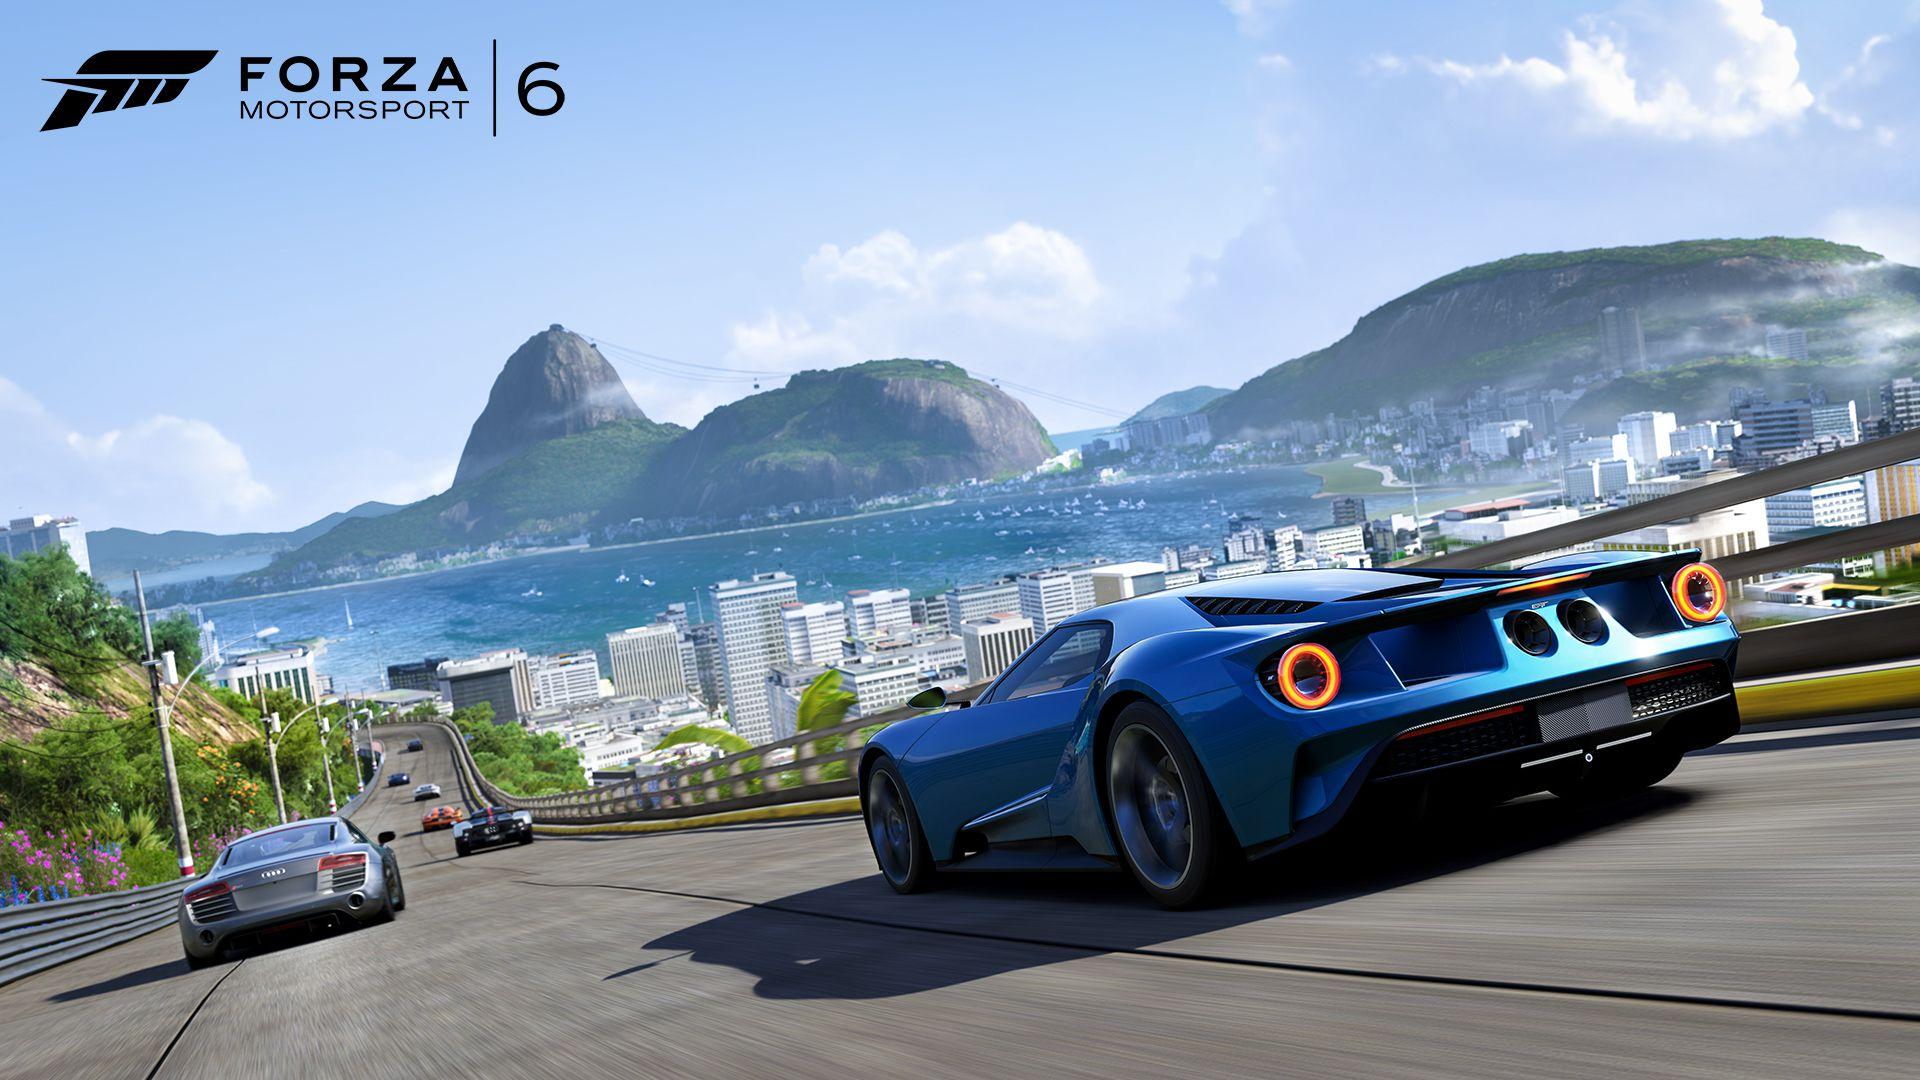 Forza6-E3-PressKit-06-WM-jpg.0.jpg